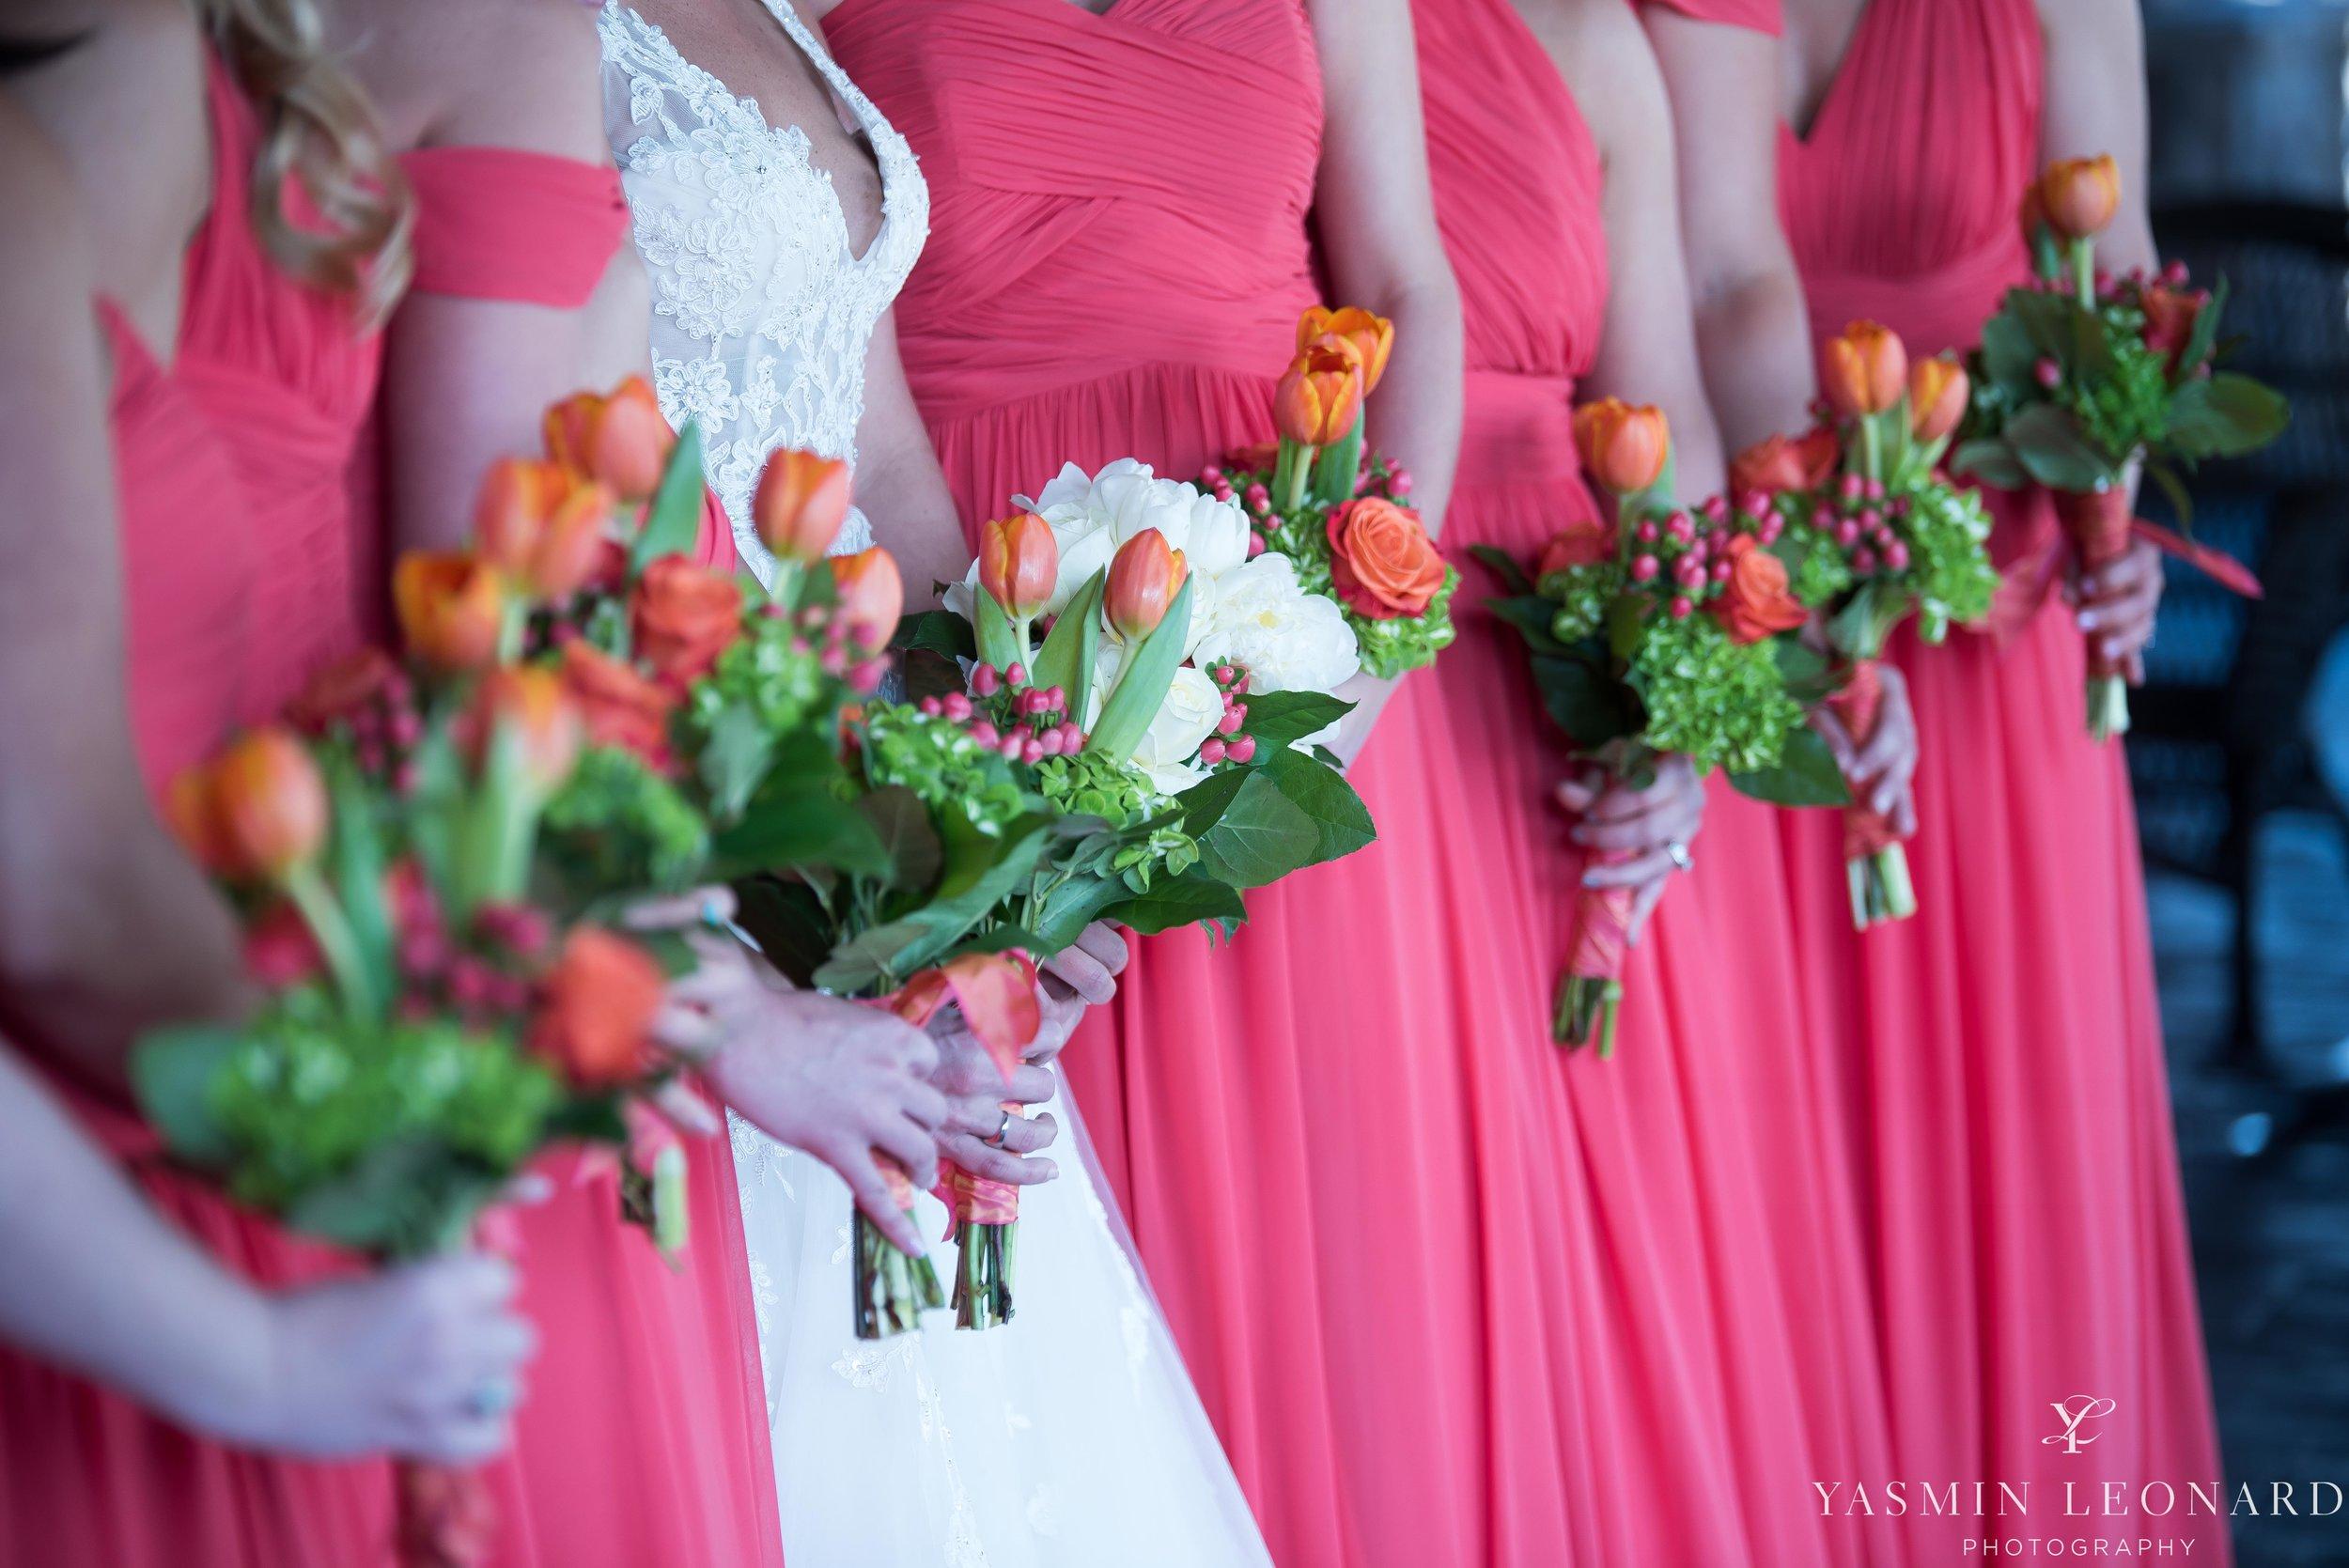 Adaumont Farm - Adaumont Farm Weddings - Trinity Weddings - NC Weddings - Yasmin Leonard Photography-15.jpg